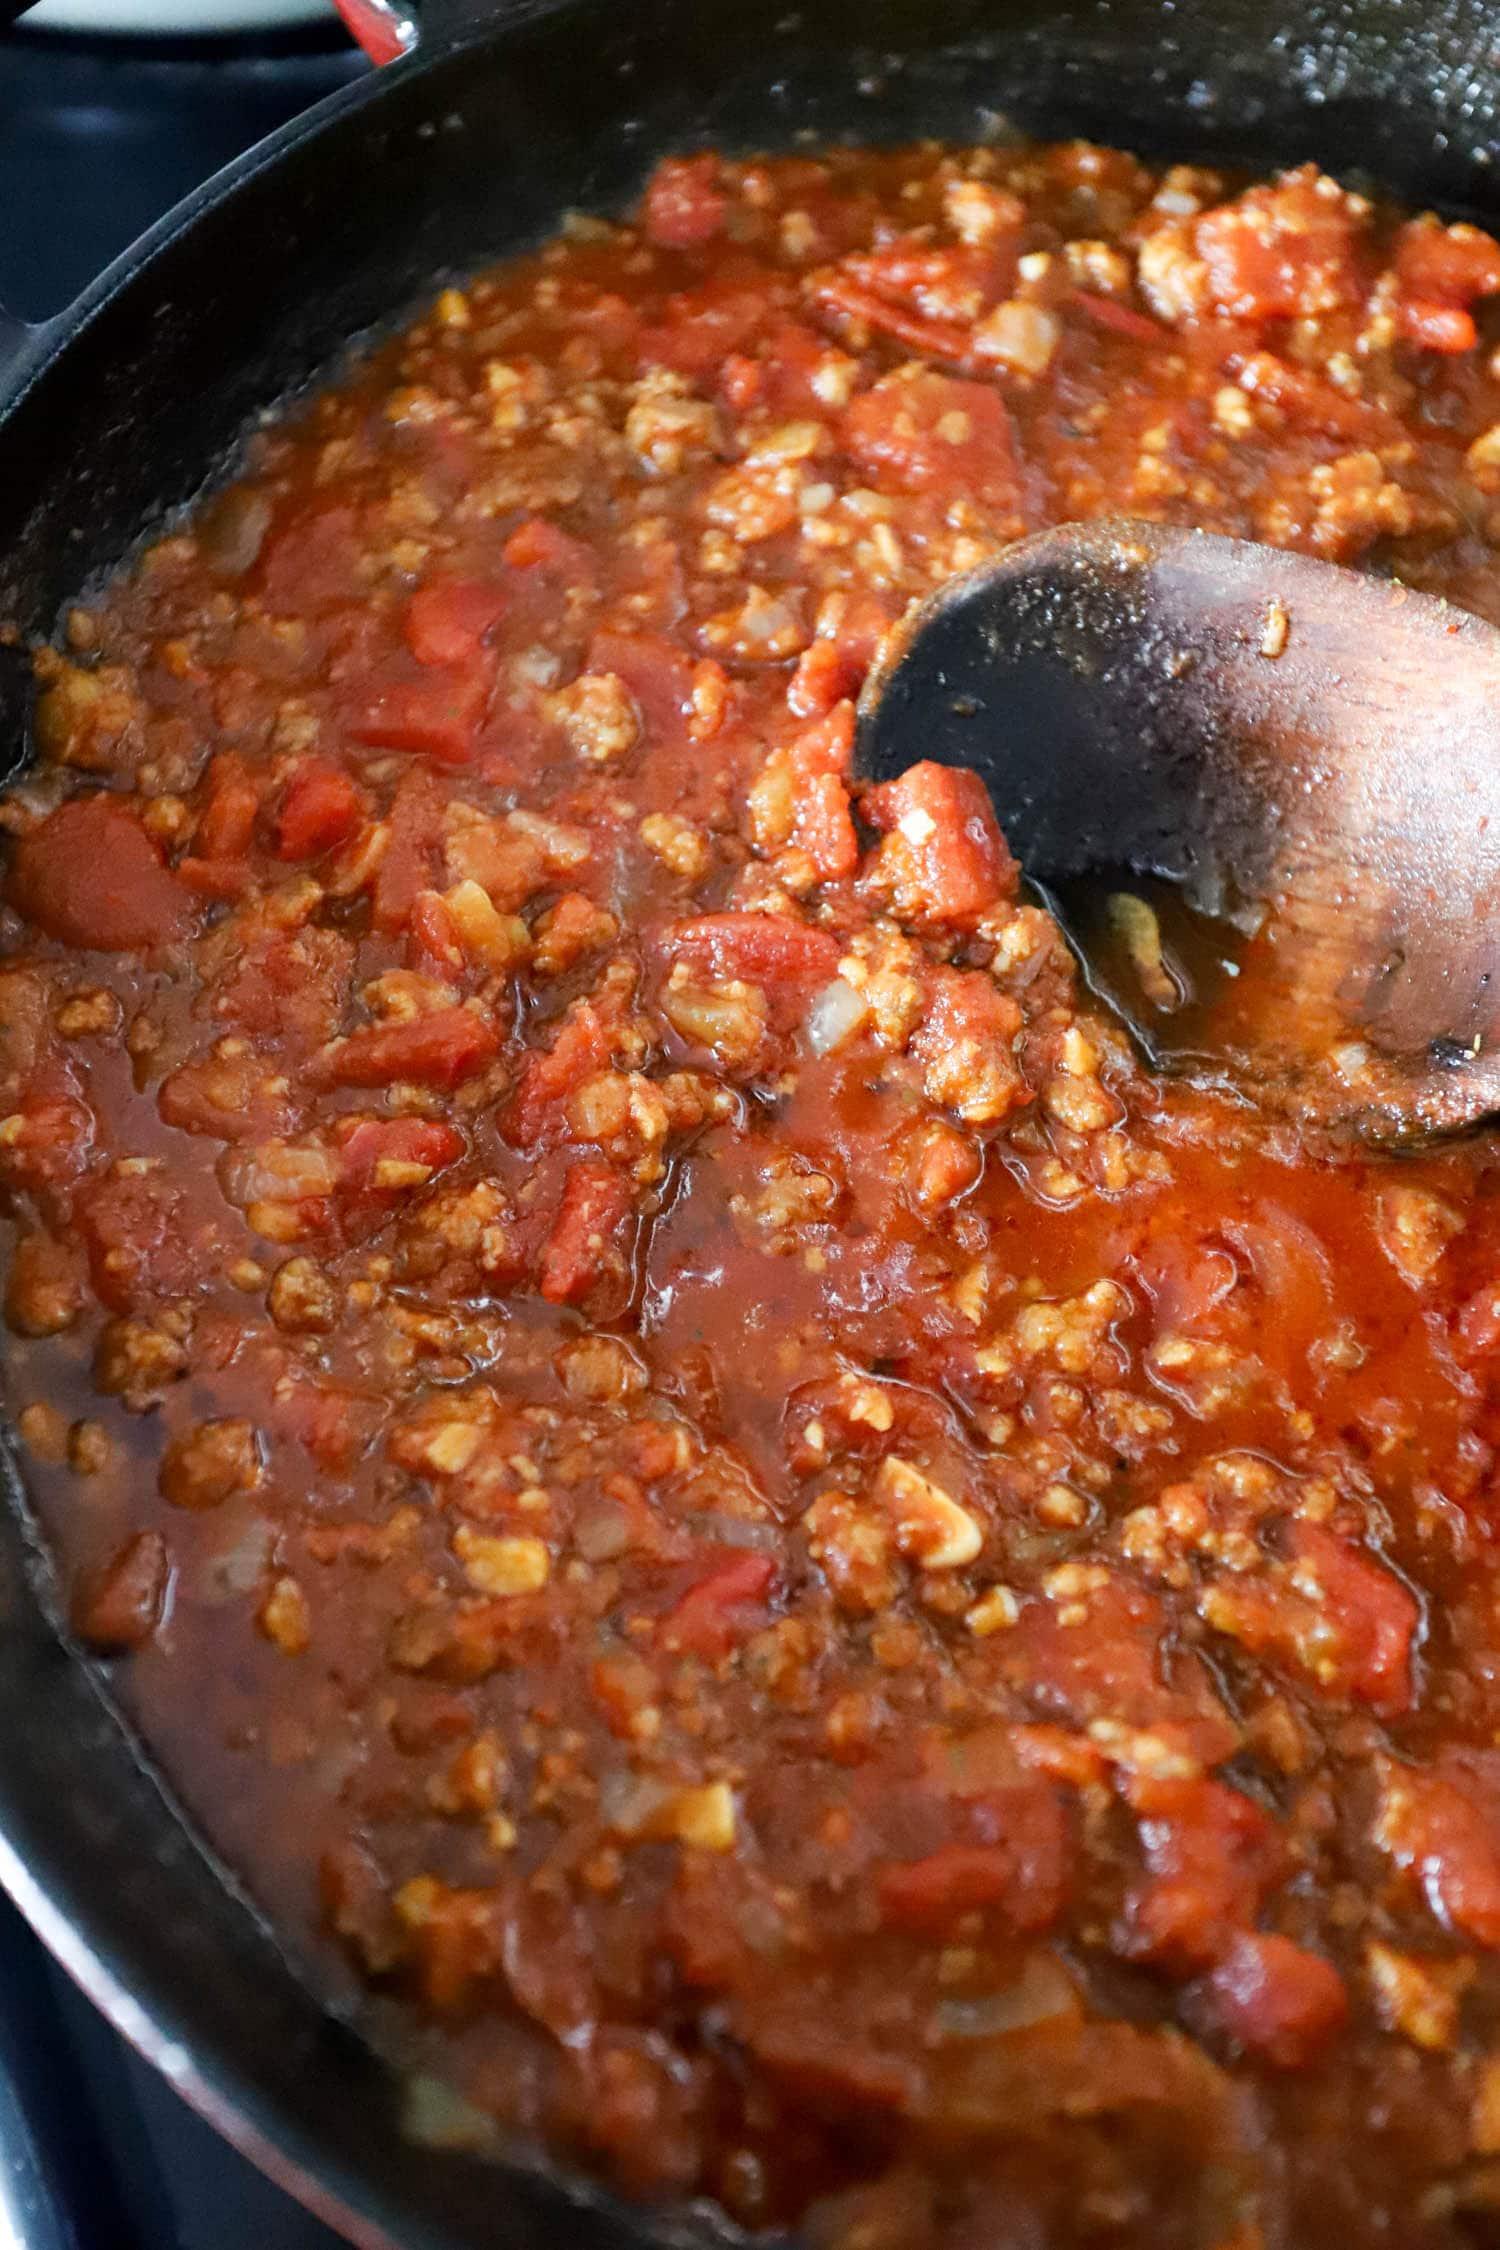 tomato sauce image with vodka and sausage